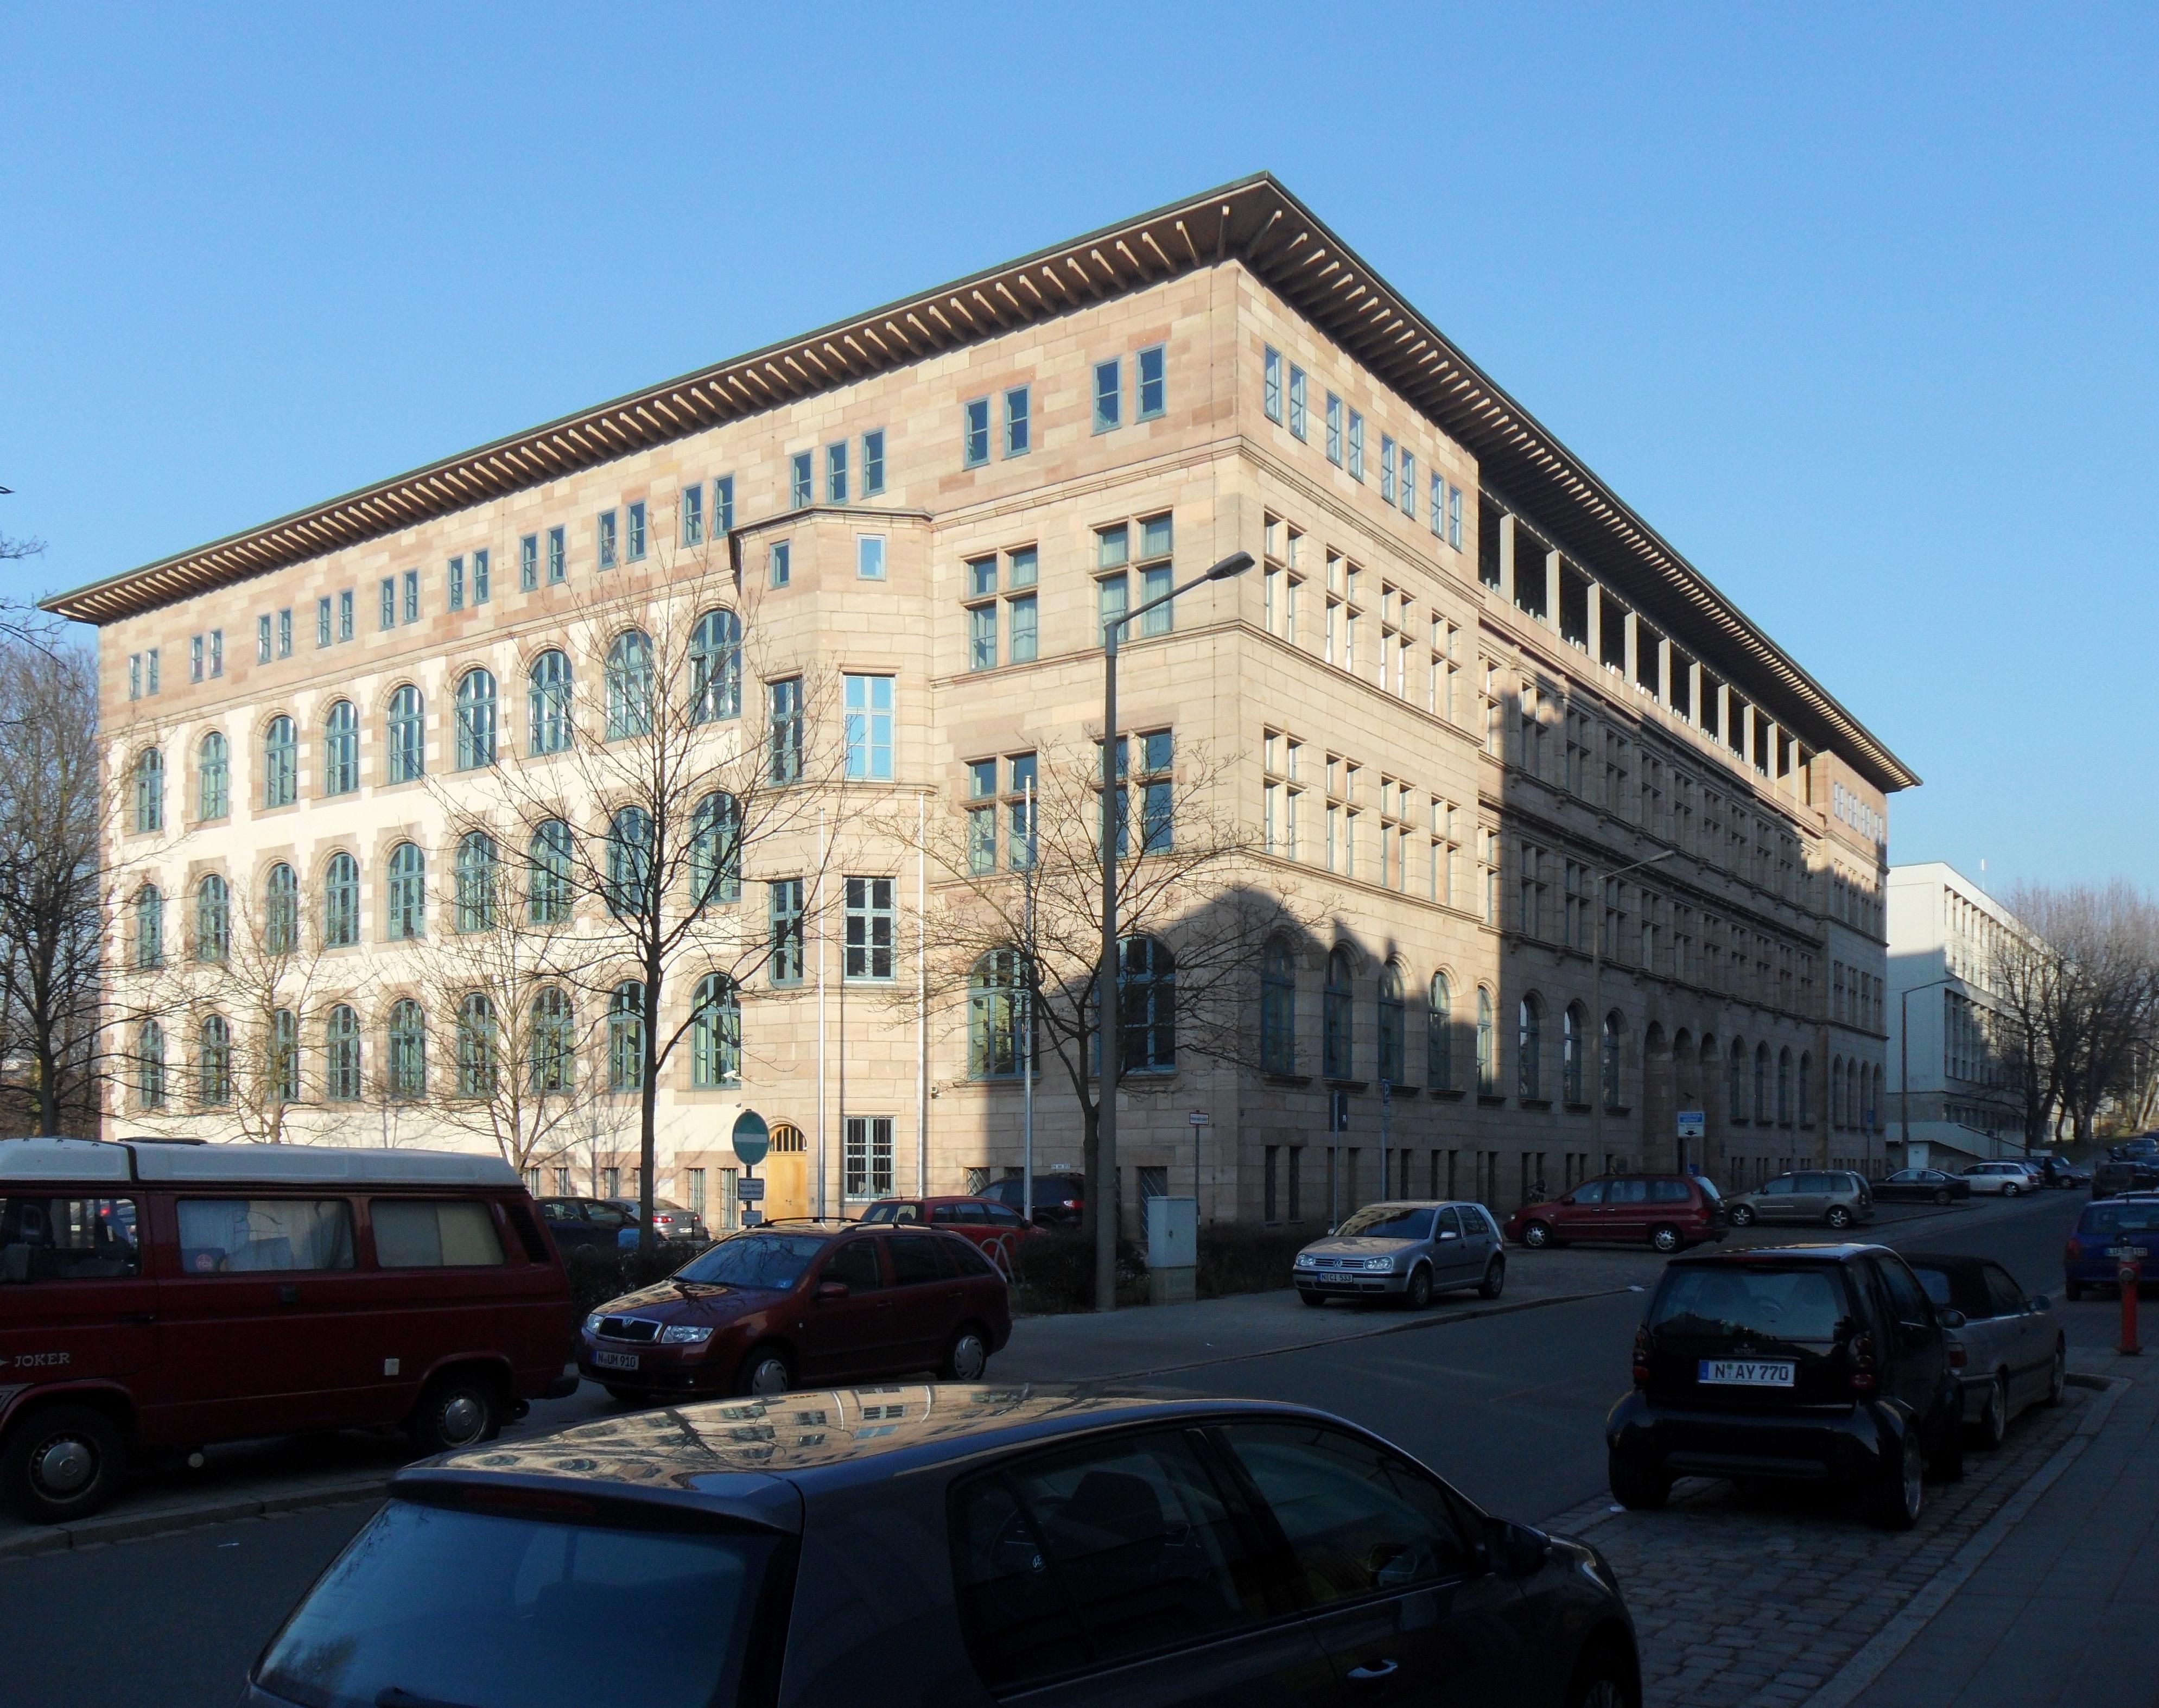 Amtsgericht Nürnberg Flaschenhofstr file amtsgericht nürnberg flaschenhofstraße 35 marienvorstadt 04 jpg